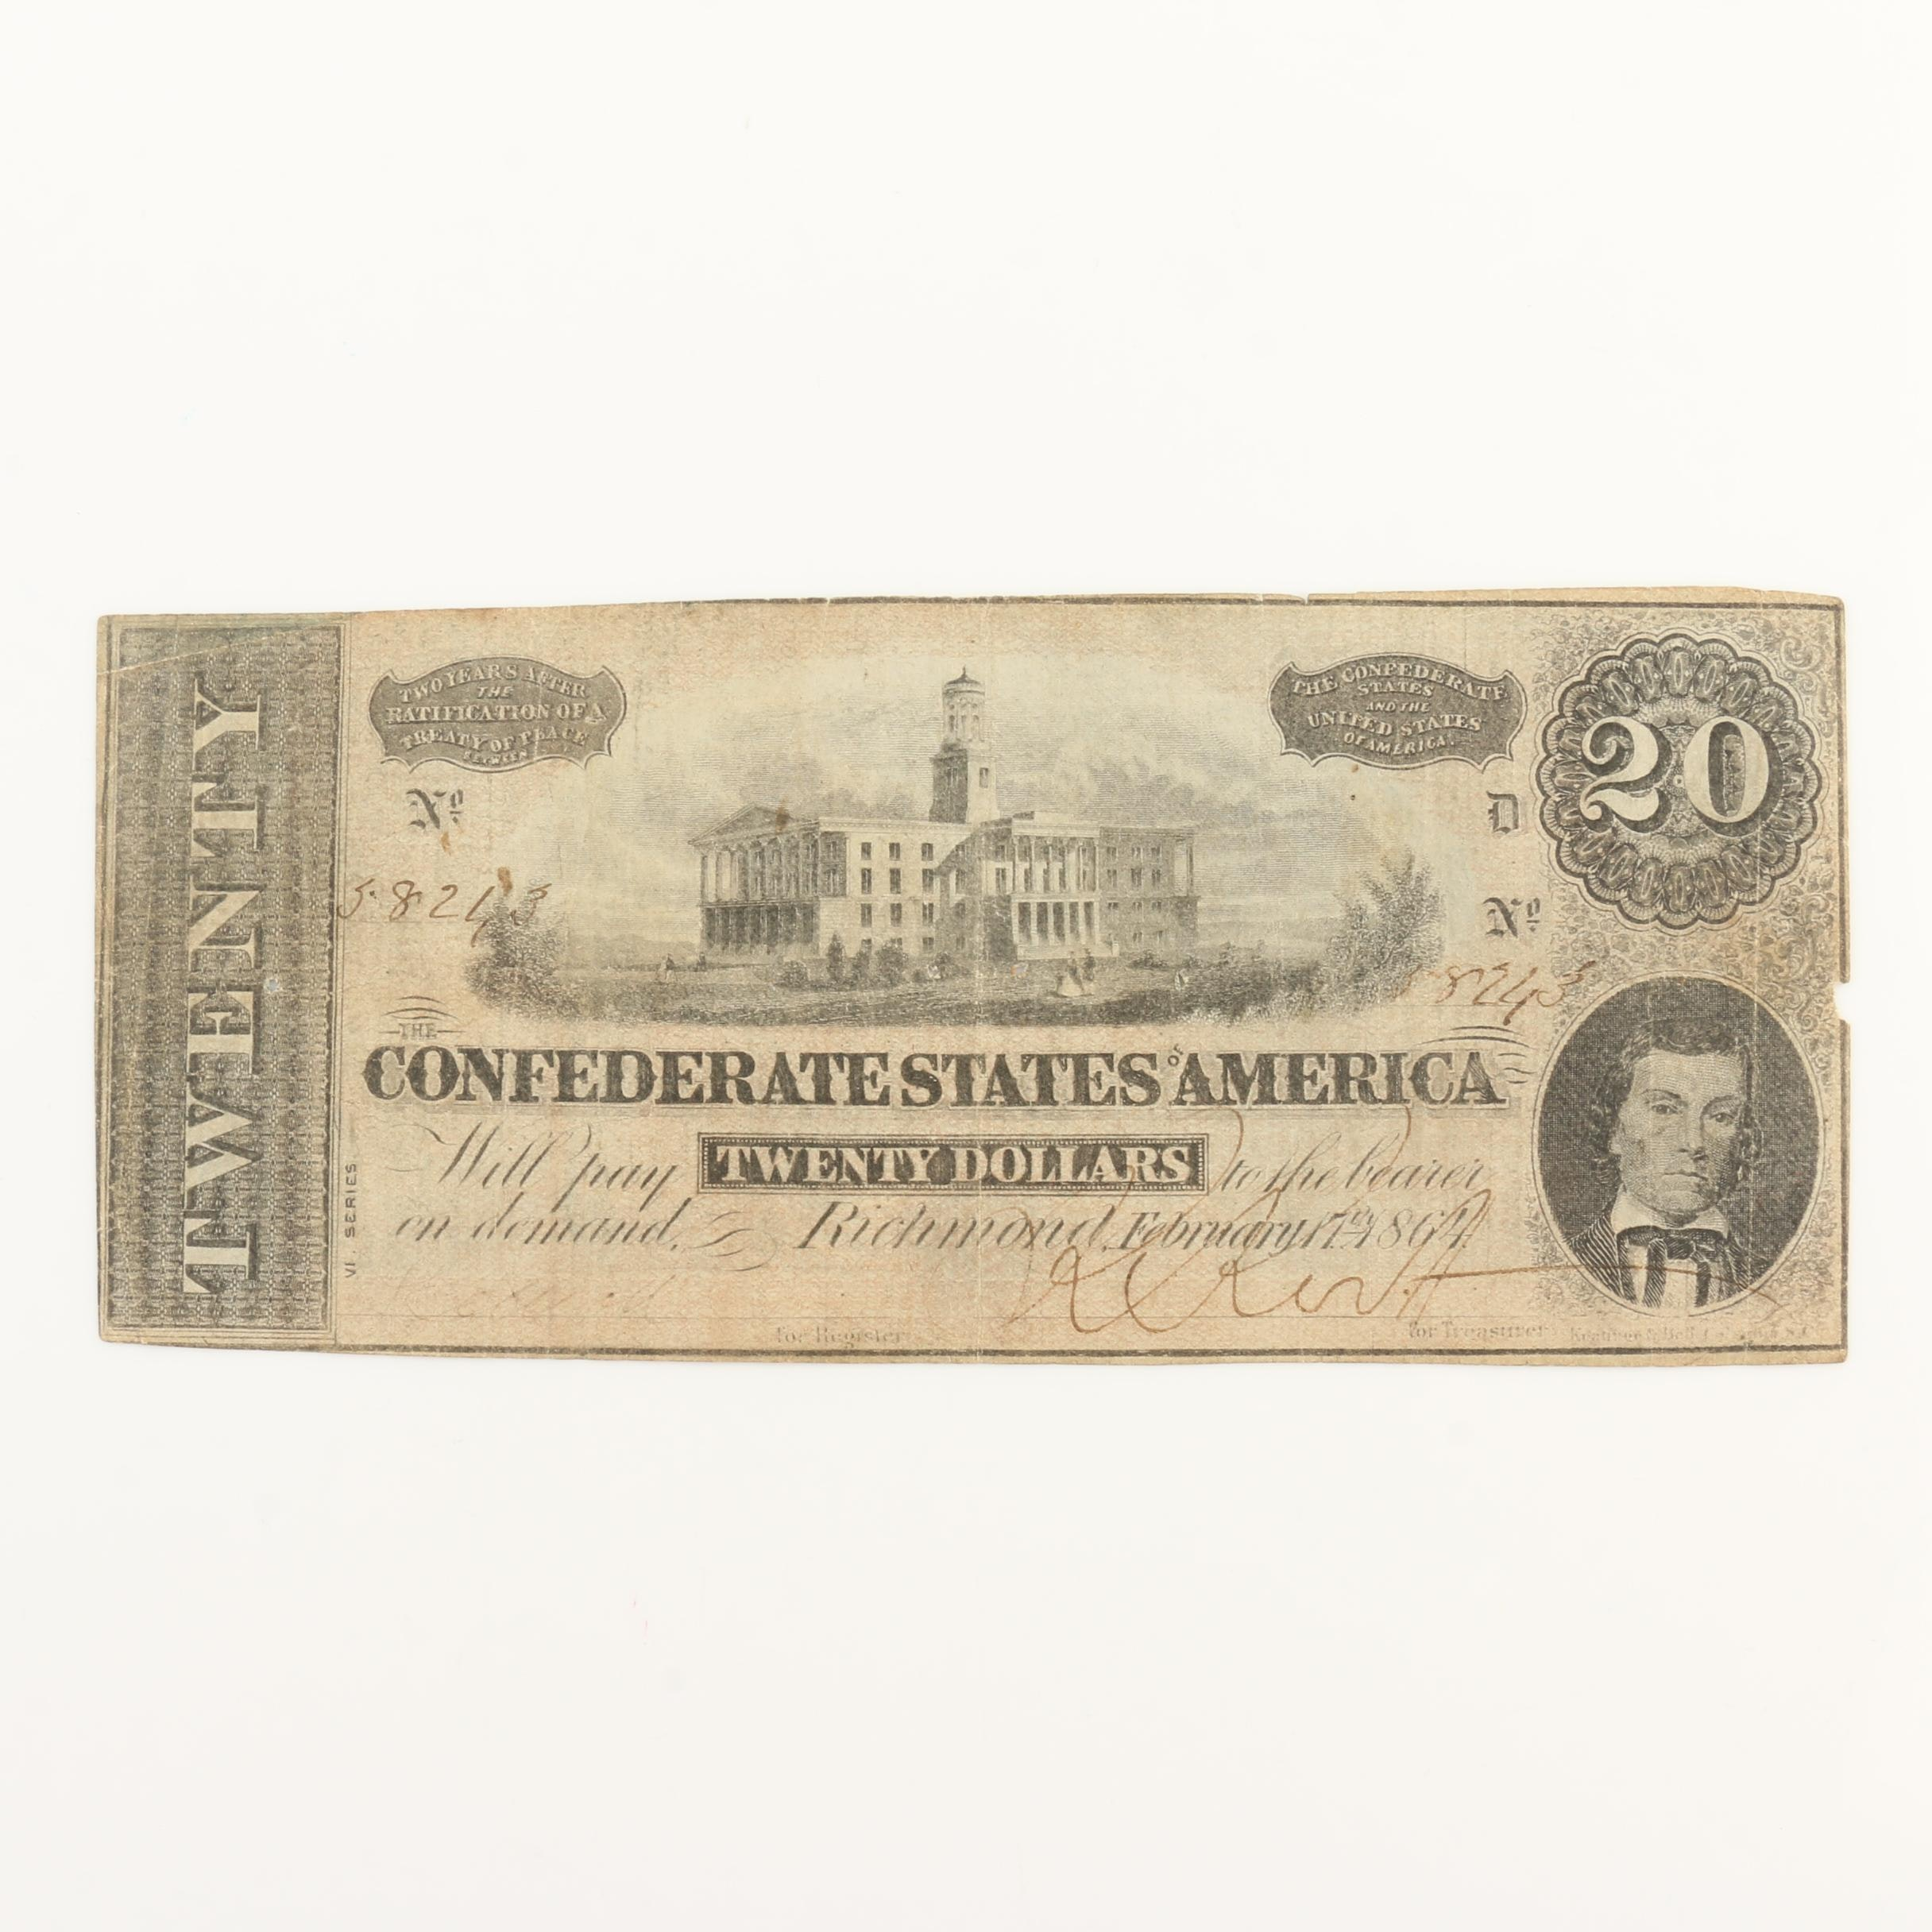 Obsolete 1864 $20 Confederate States of America Banknote